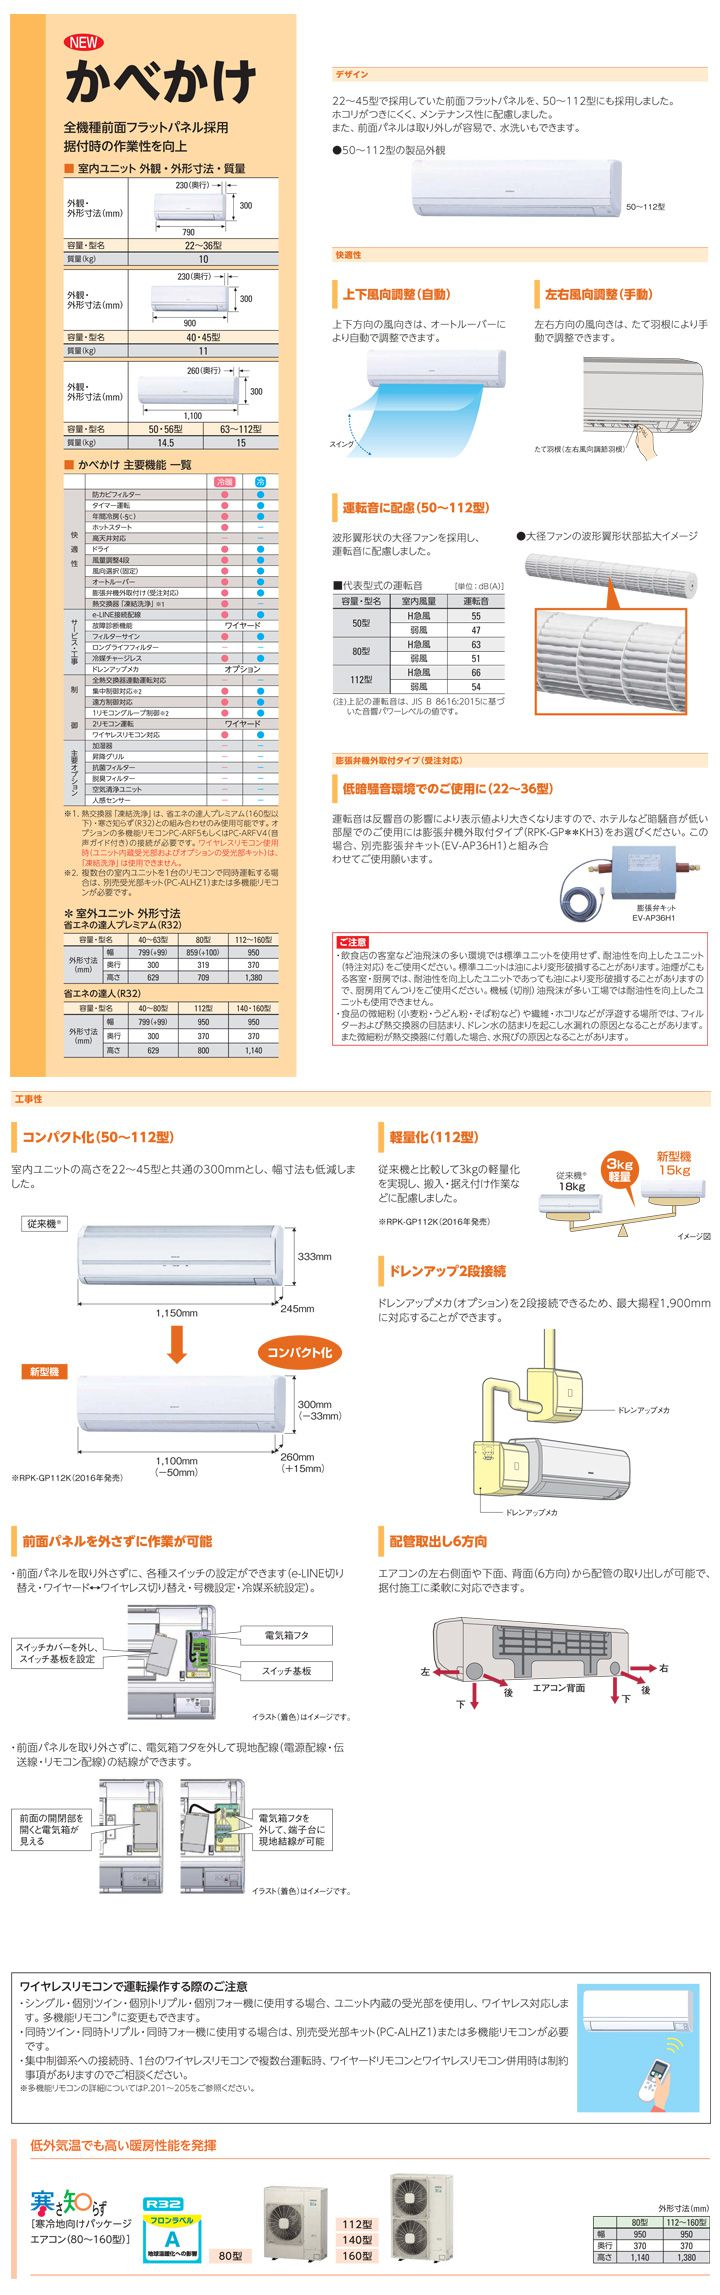 RPK-GP160RHNGカタログ